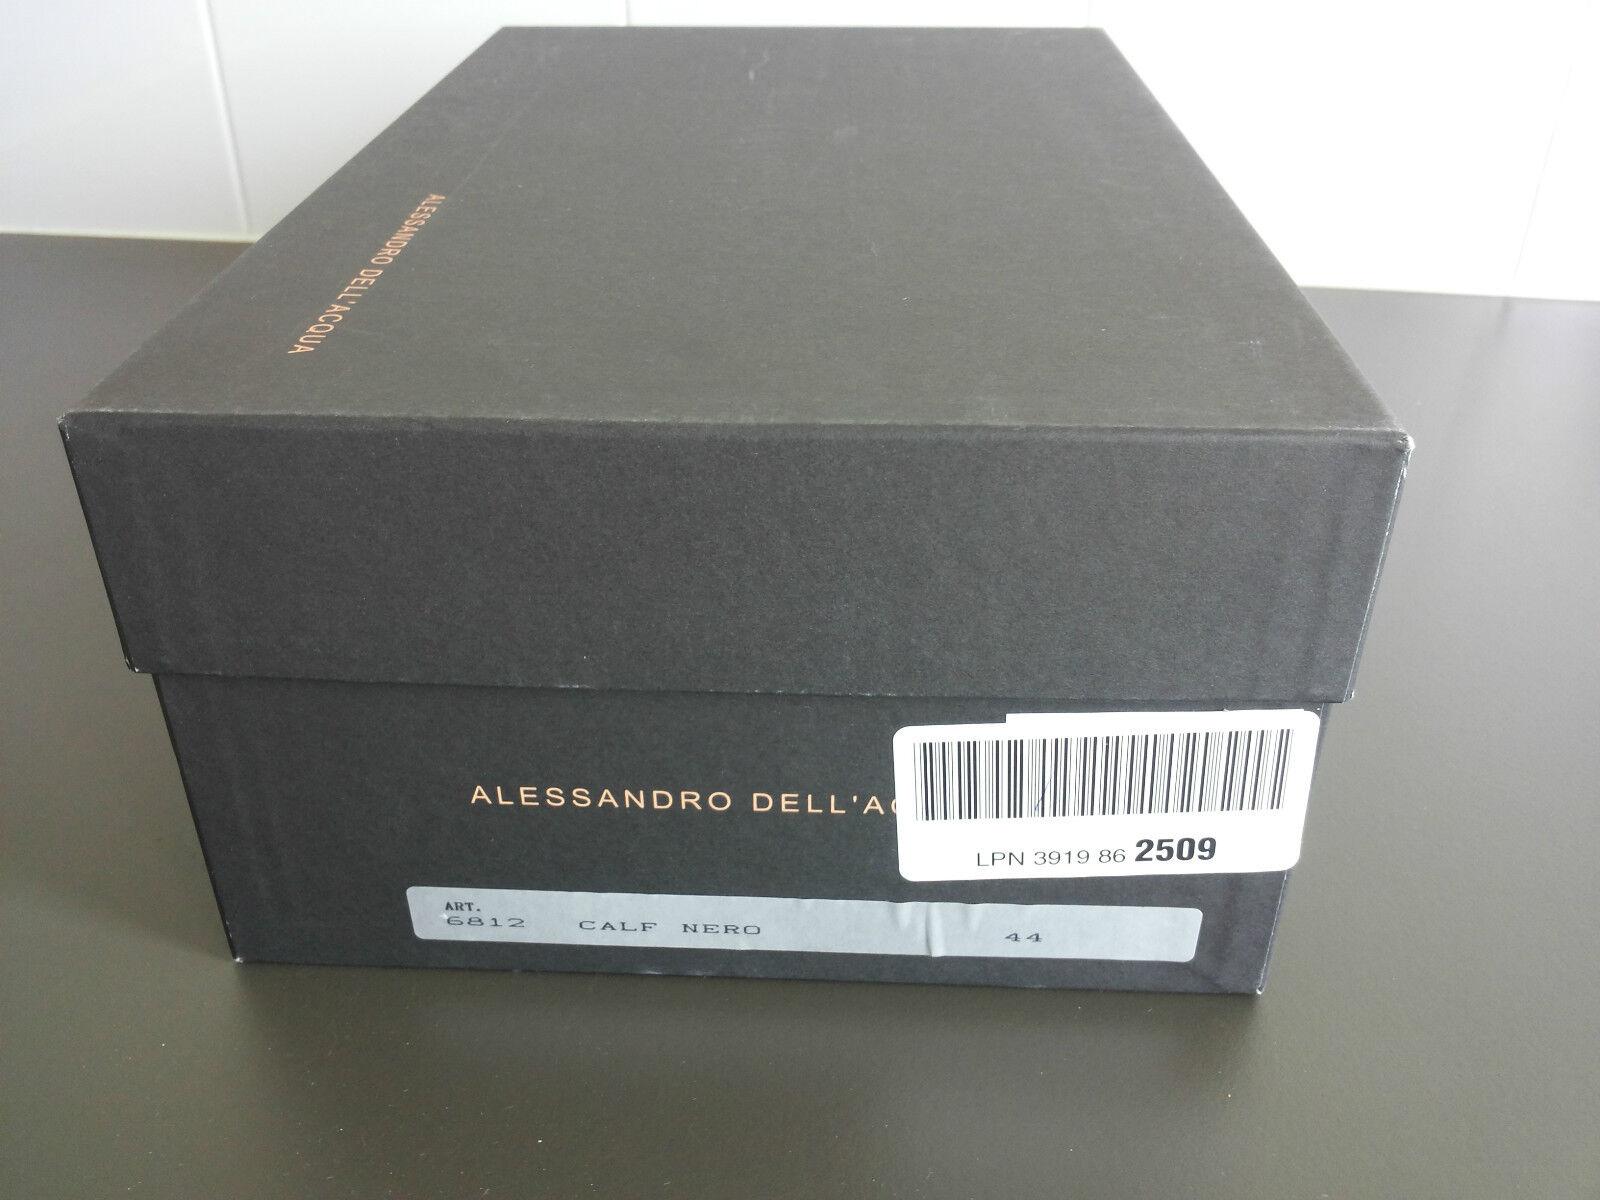 ALESSANDRO DELL''ACQUA SLIP-ON schuhe, SZ 44 EU, BNIB,  440 440 440 USD aa1bca